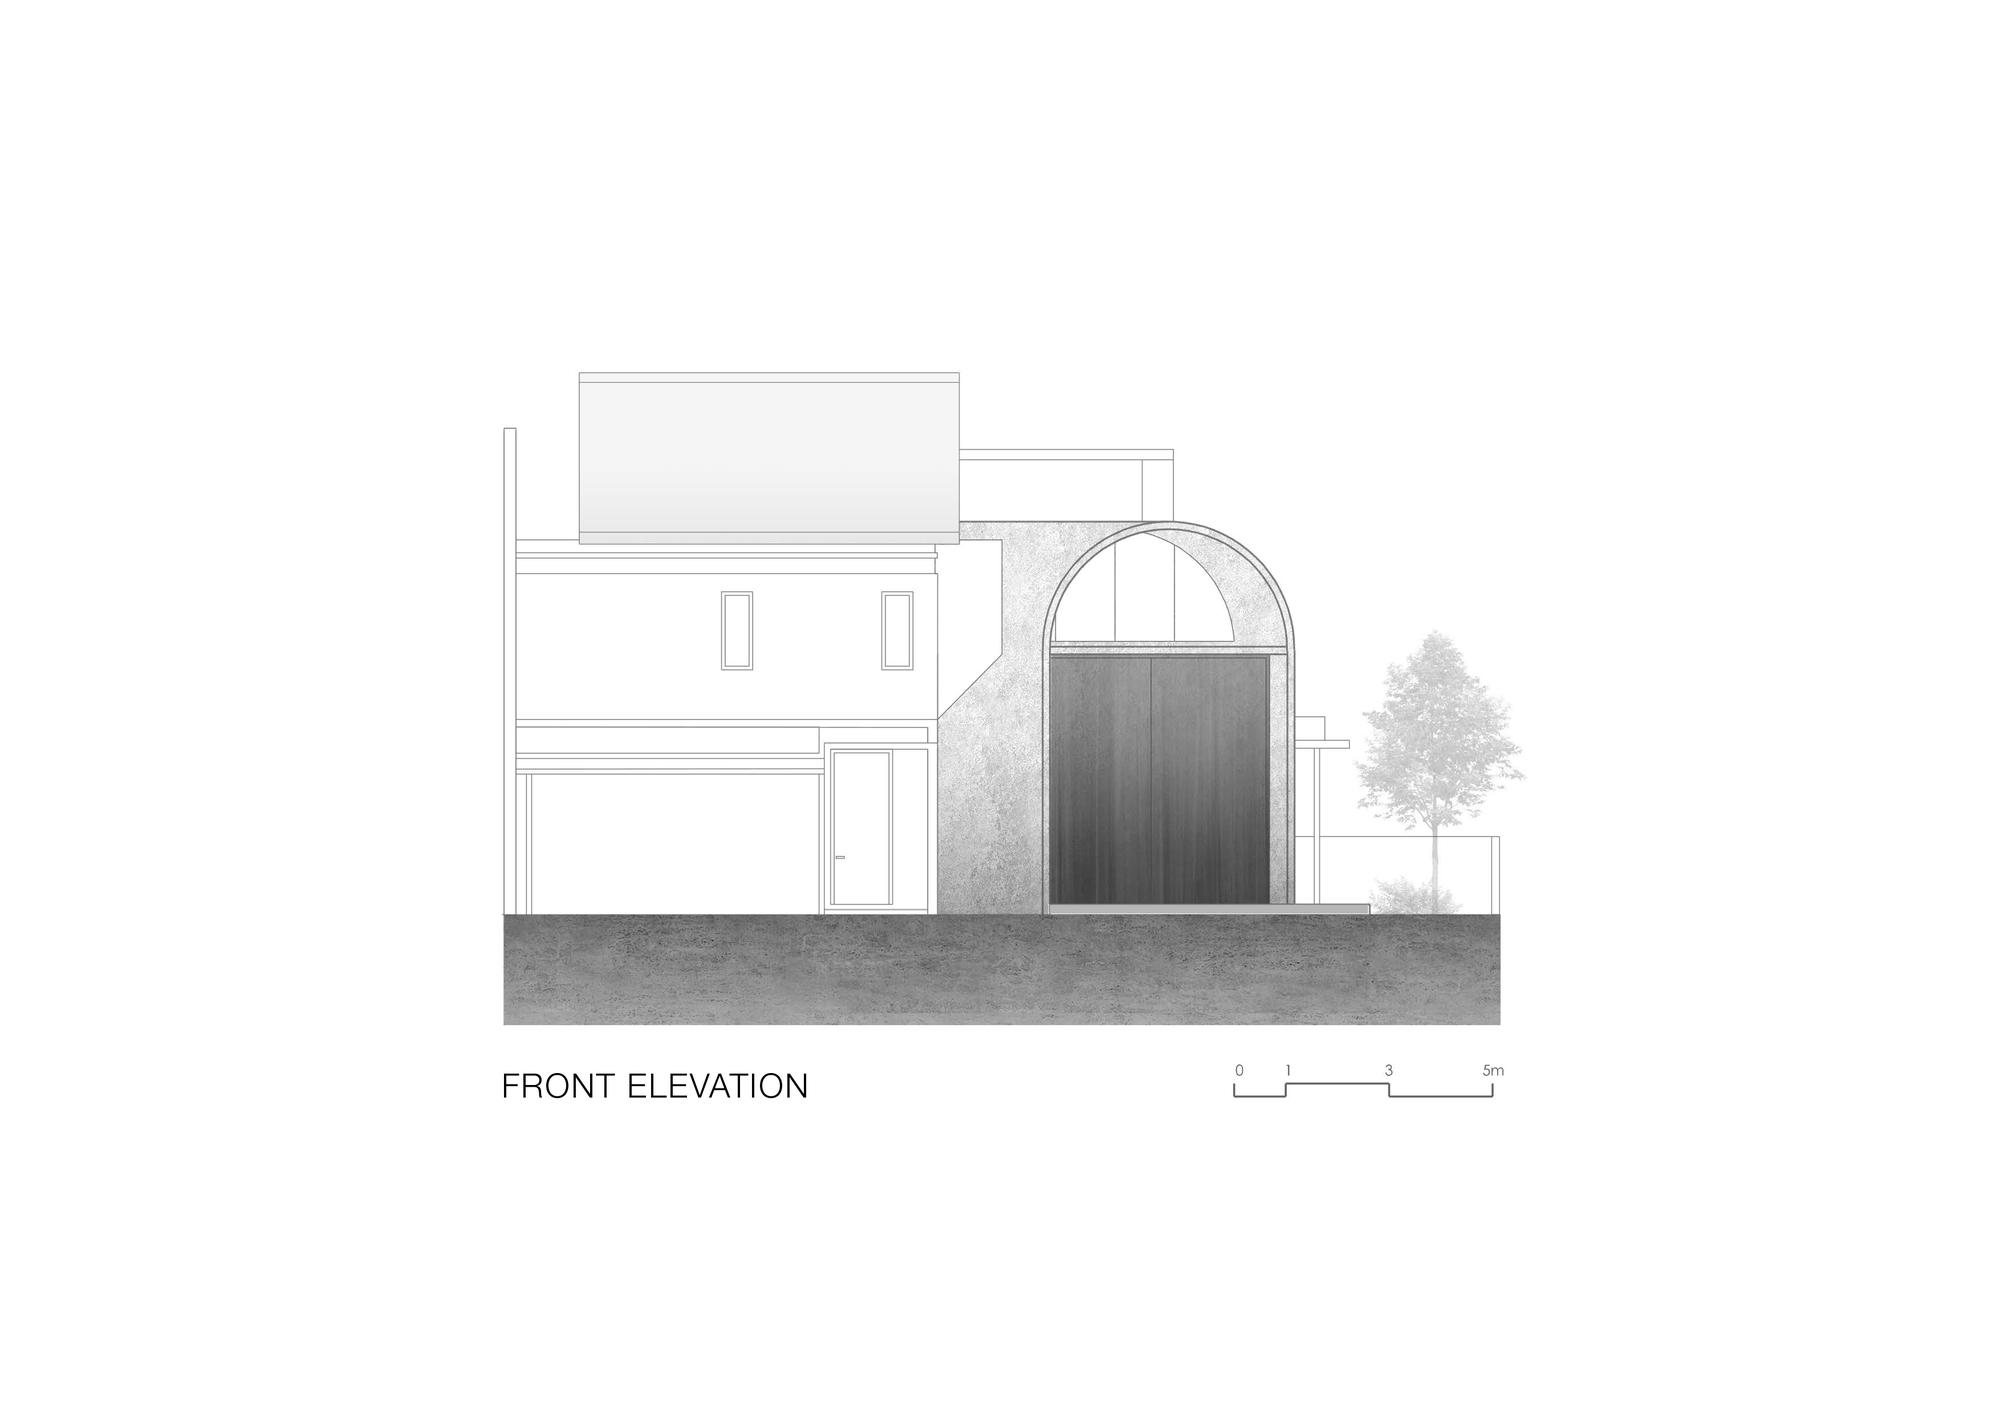 m3 _bewboc_house_drawings_w_legend-4.jpg